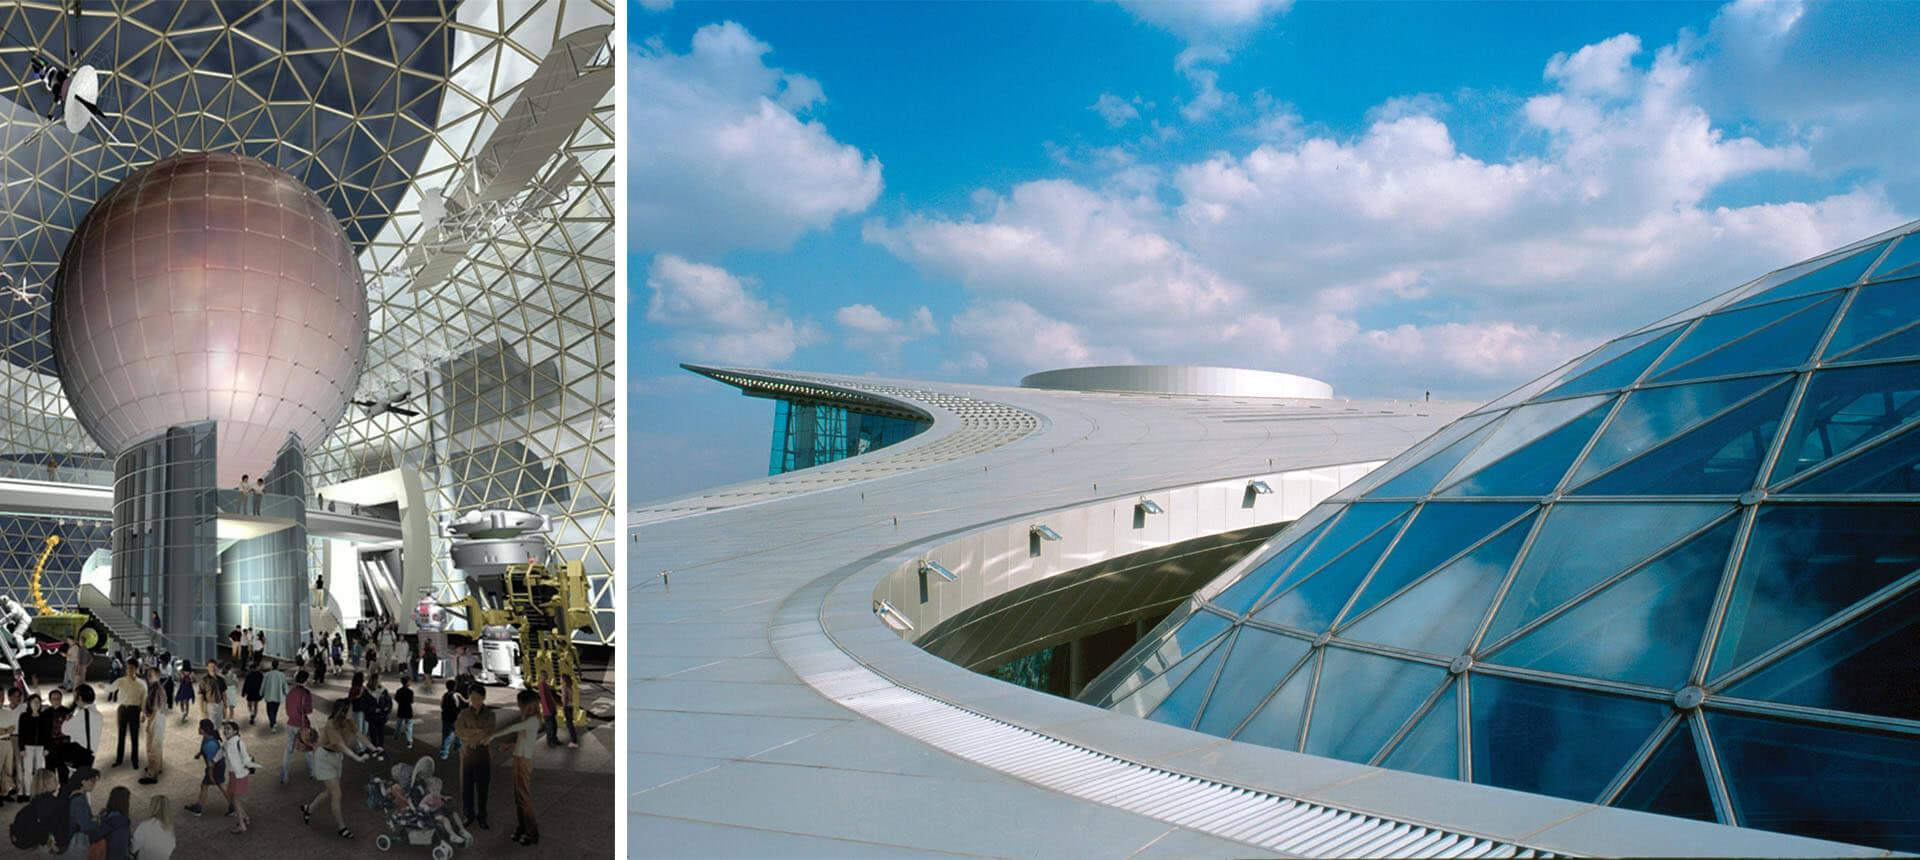 Shanghai Science And Technology Museum. CallisonRTKL Design ...